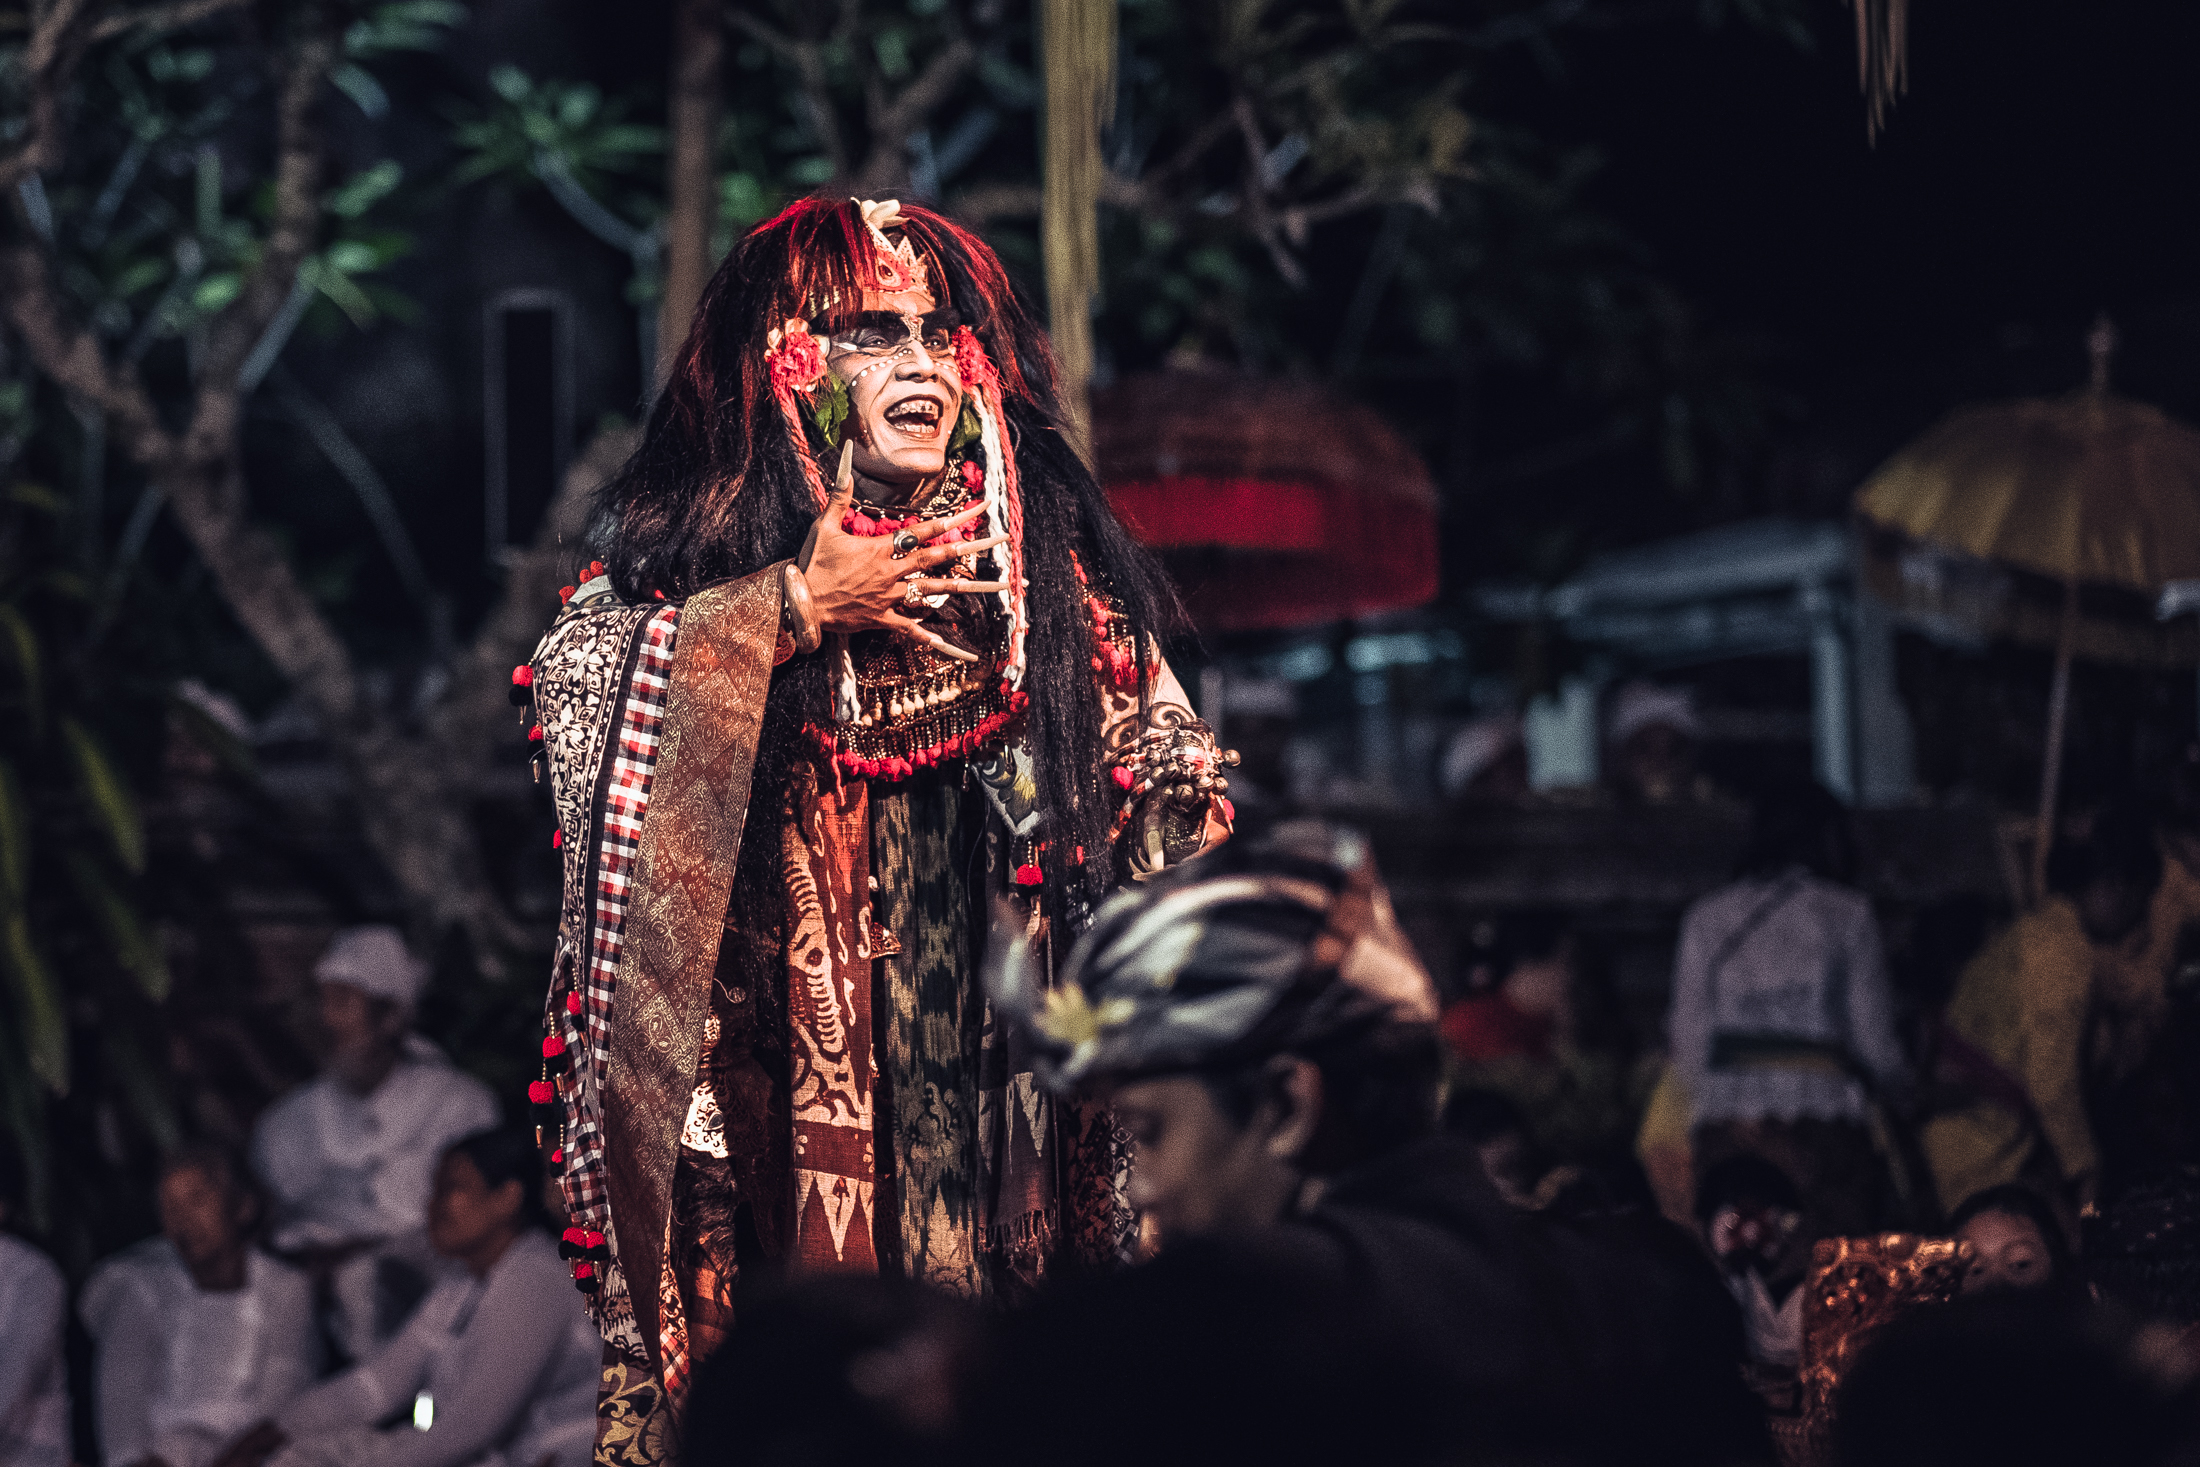 Calon Arang - A sacred Balinese ceremony